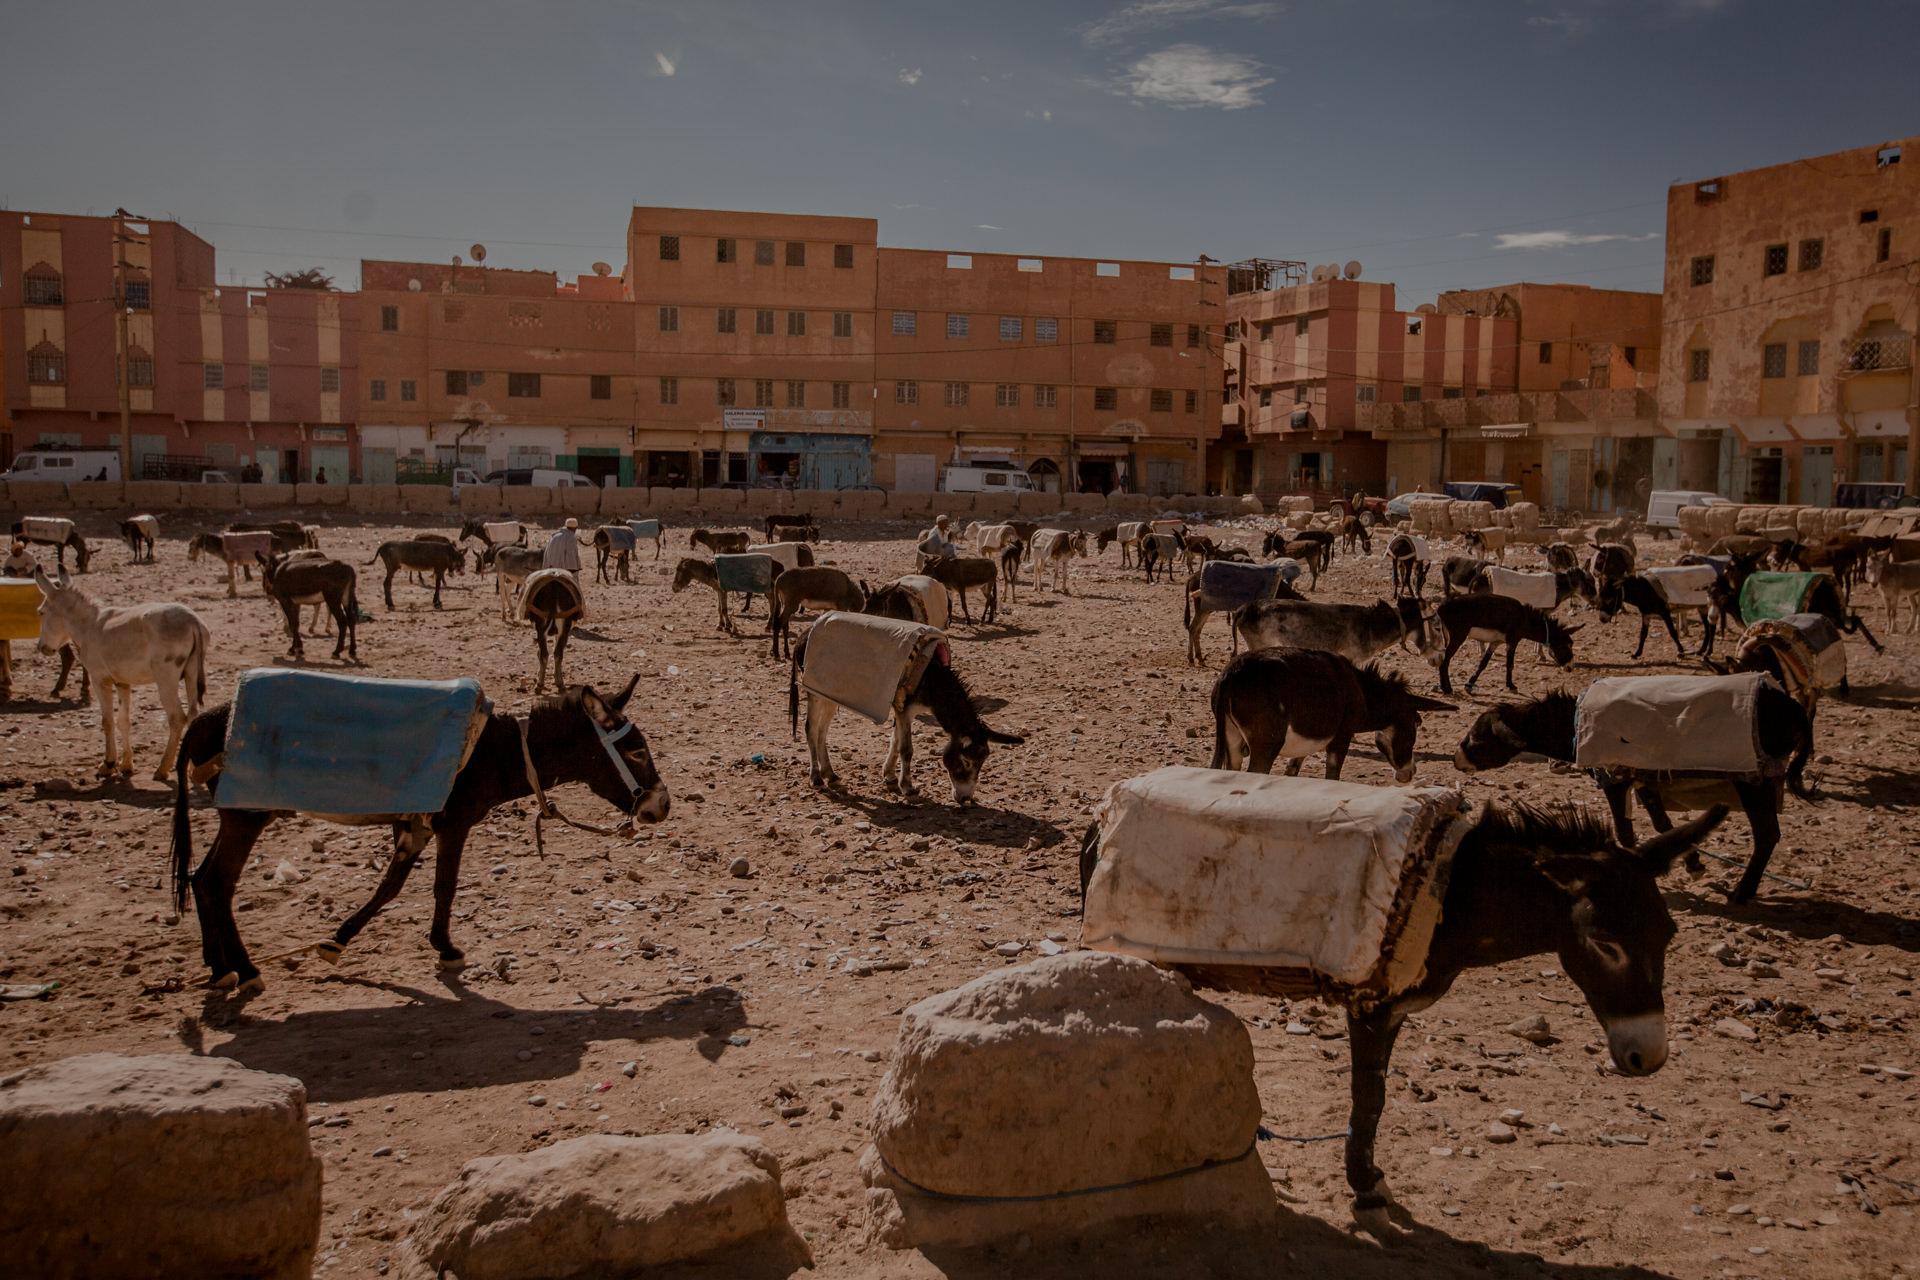 Maroko - atrakcje. Targ w Rissani